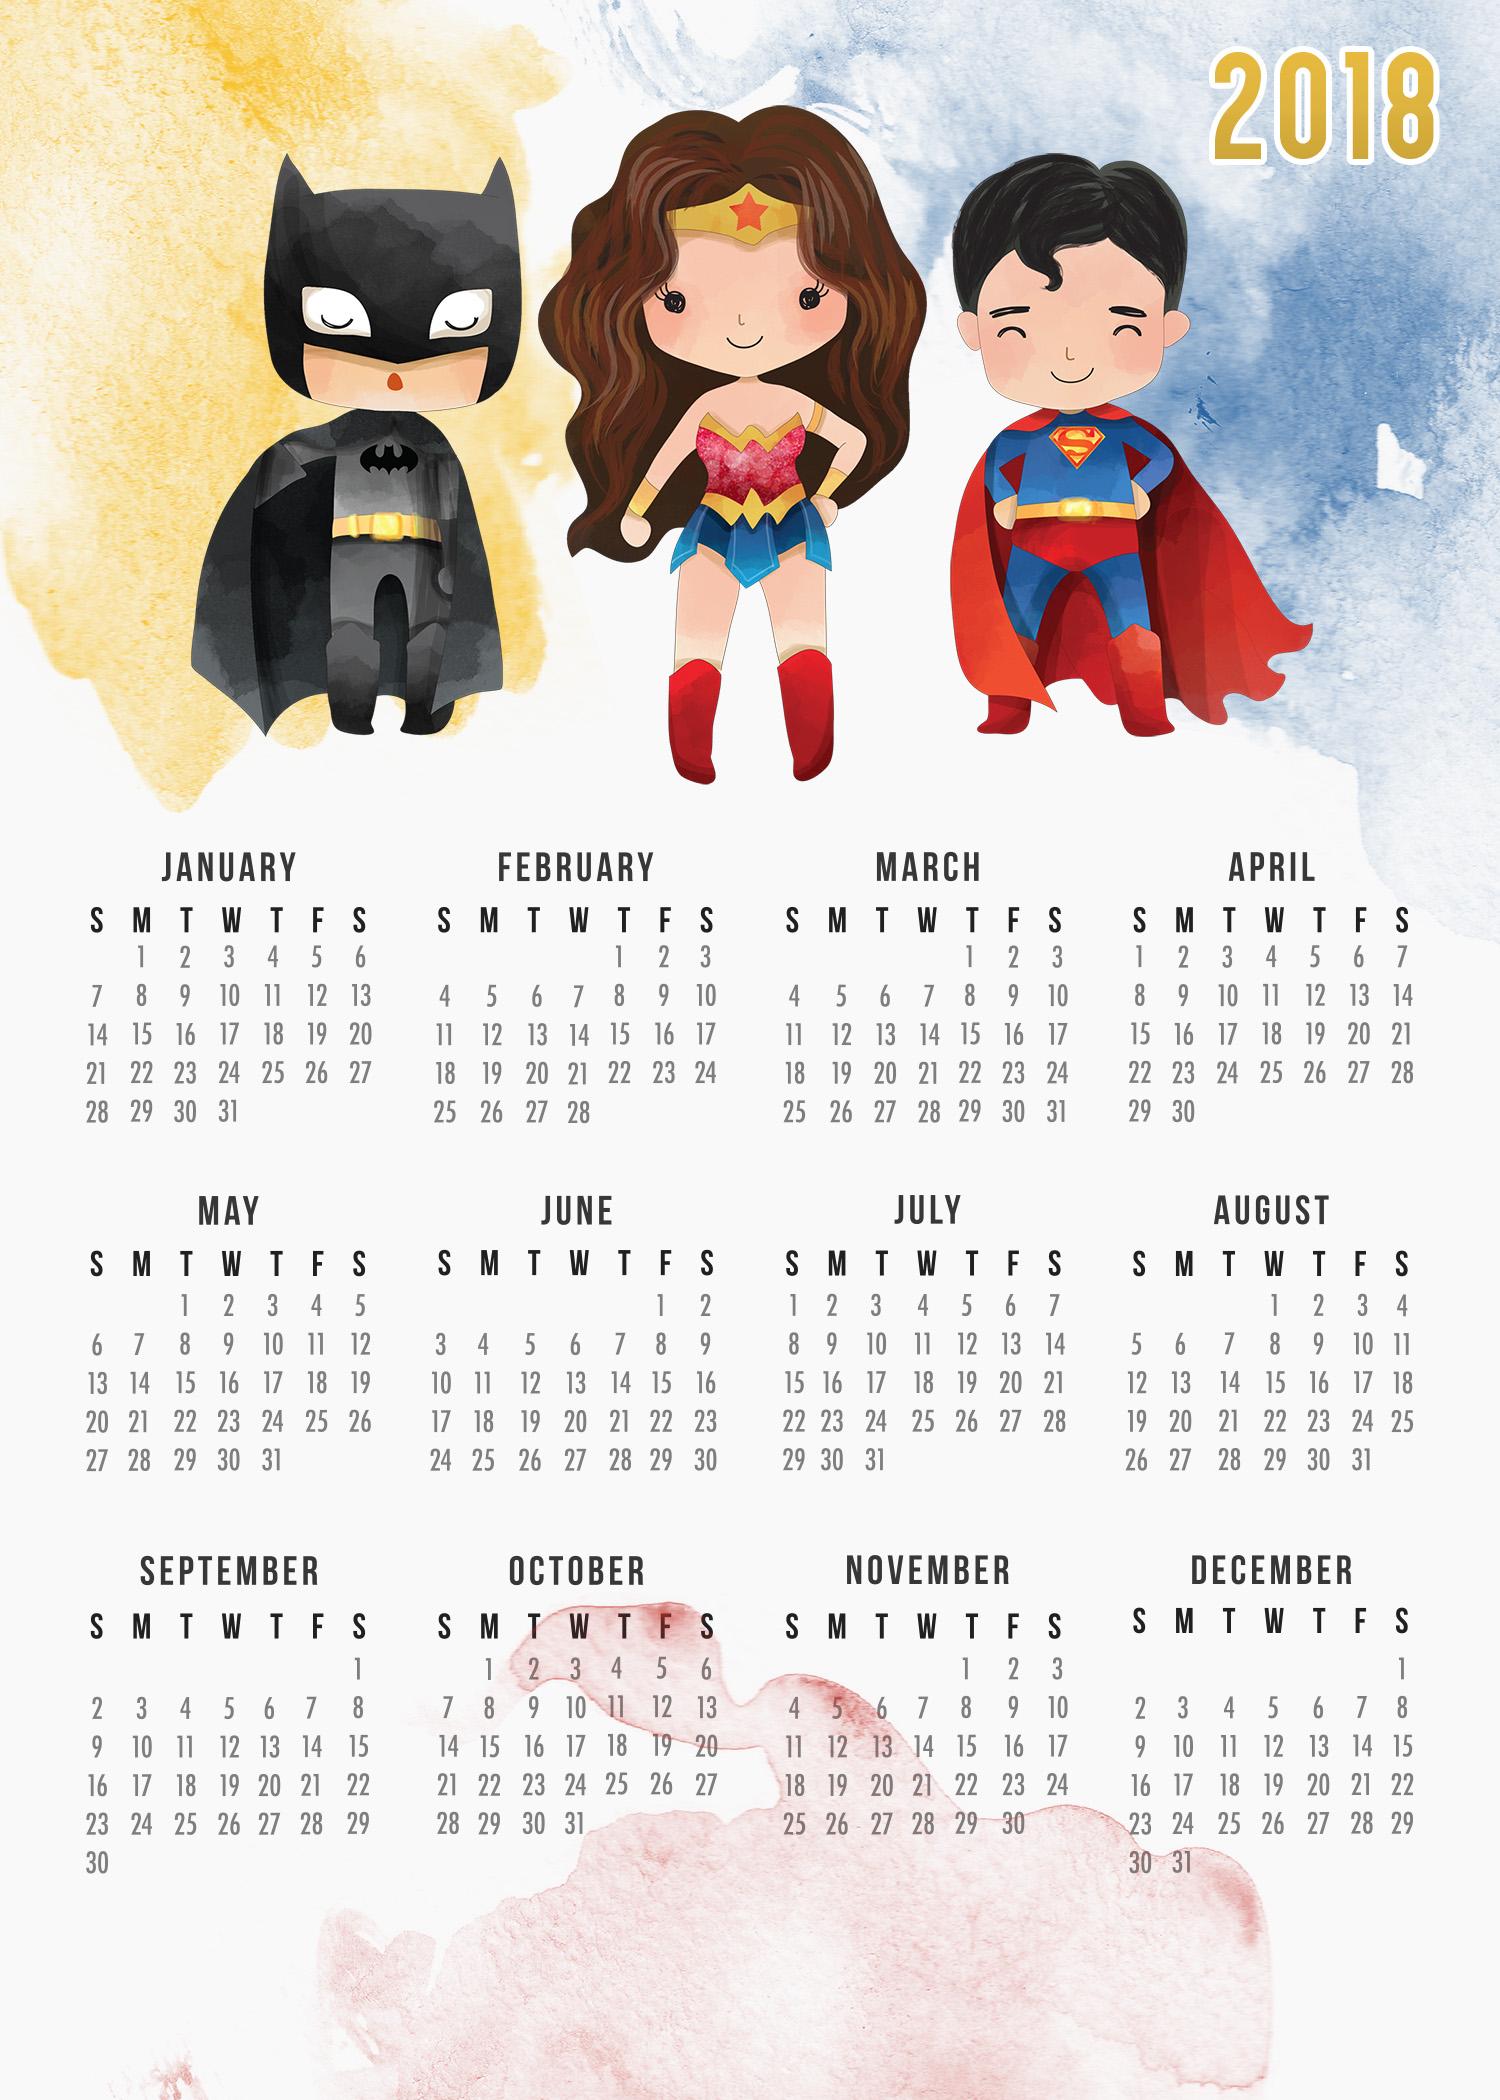 Free Printable 2018 Justice League Calendar - The Cottage ...